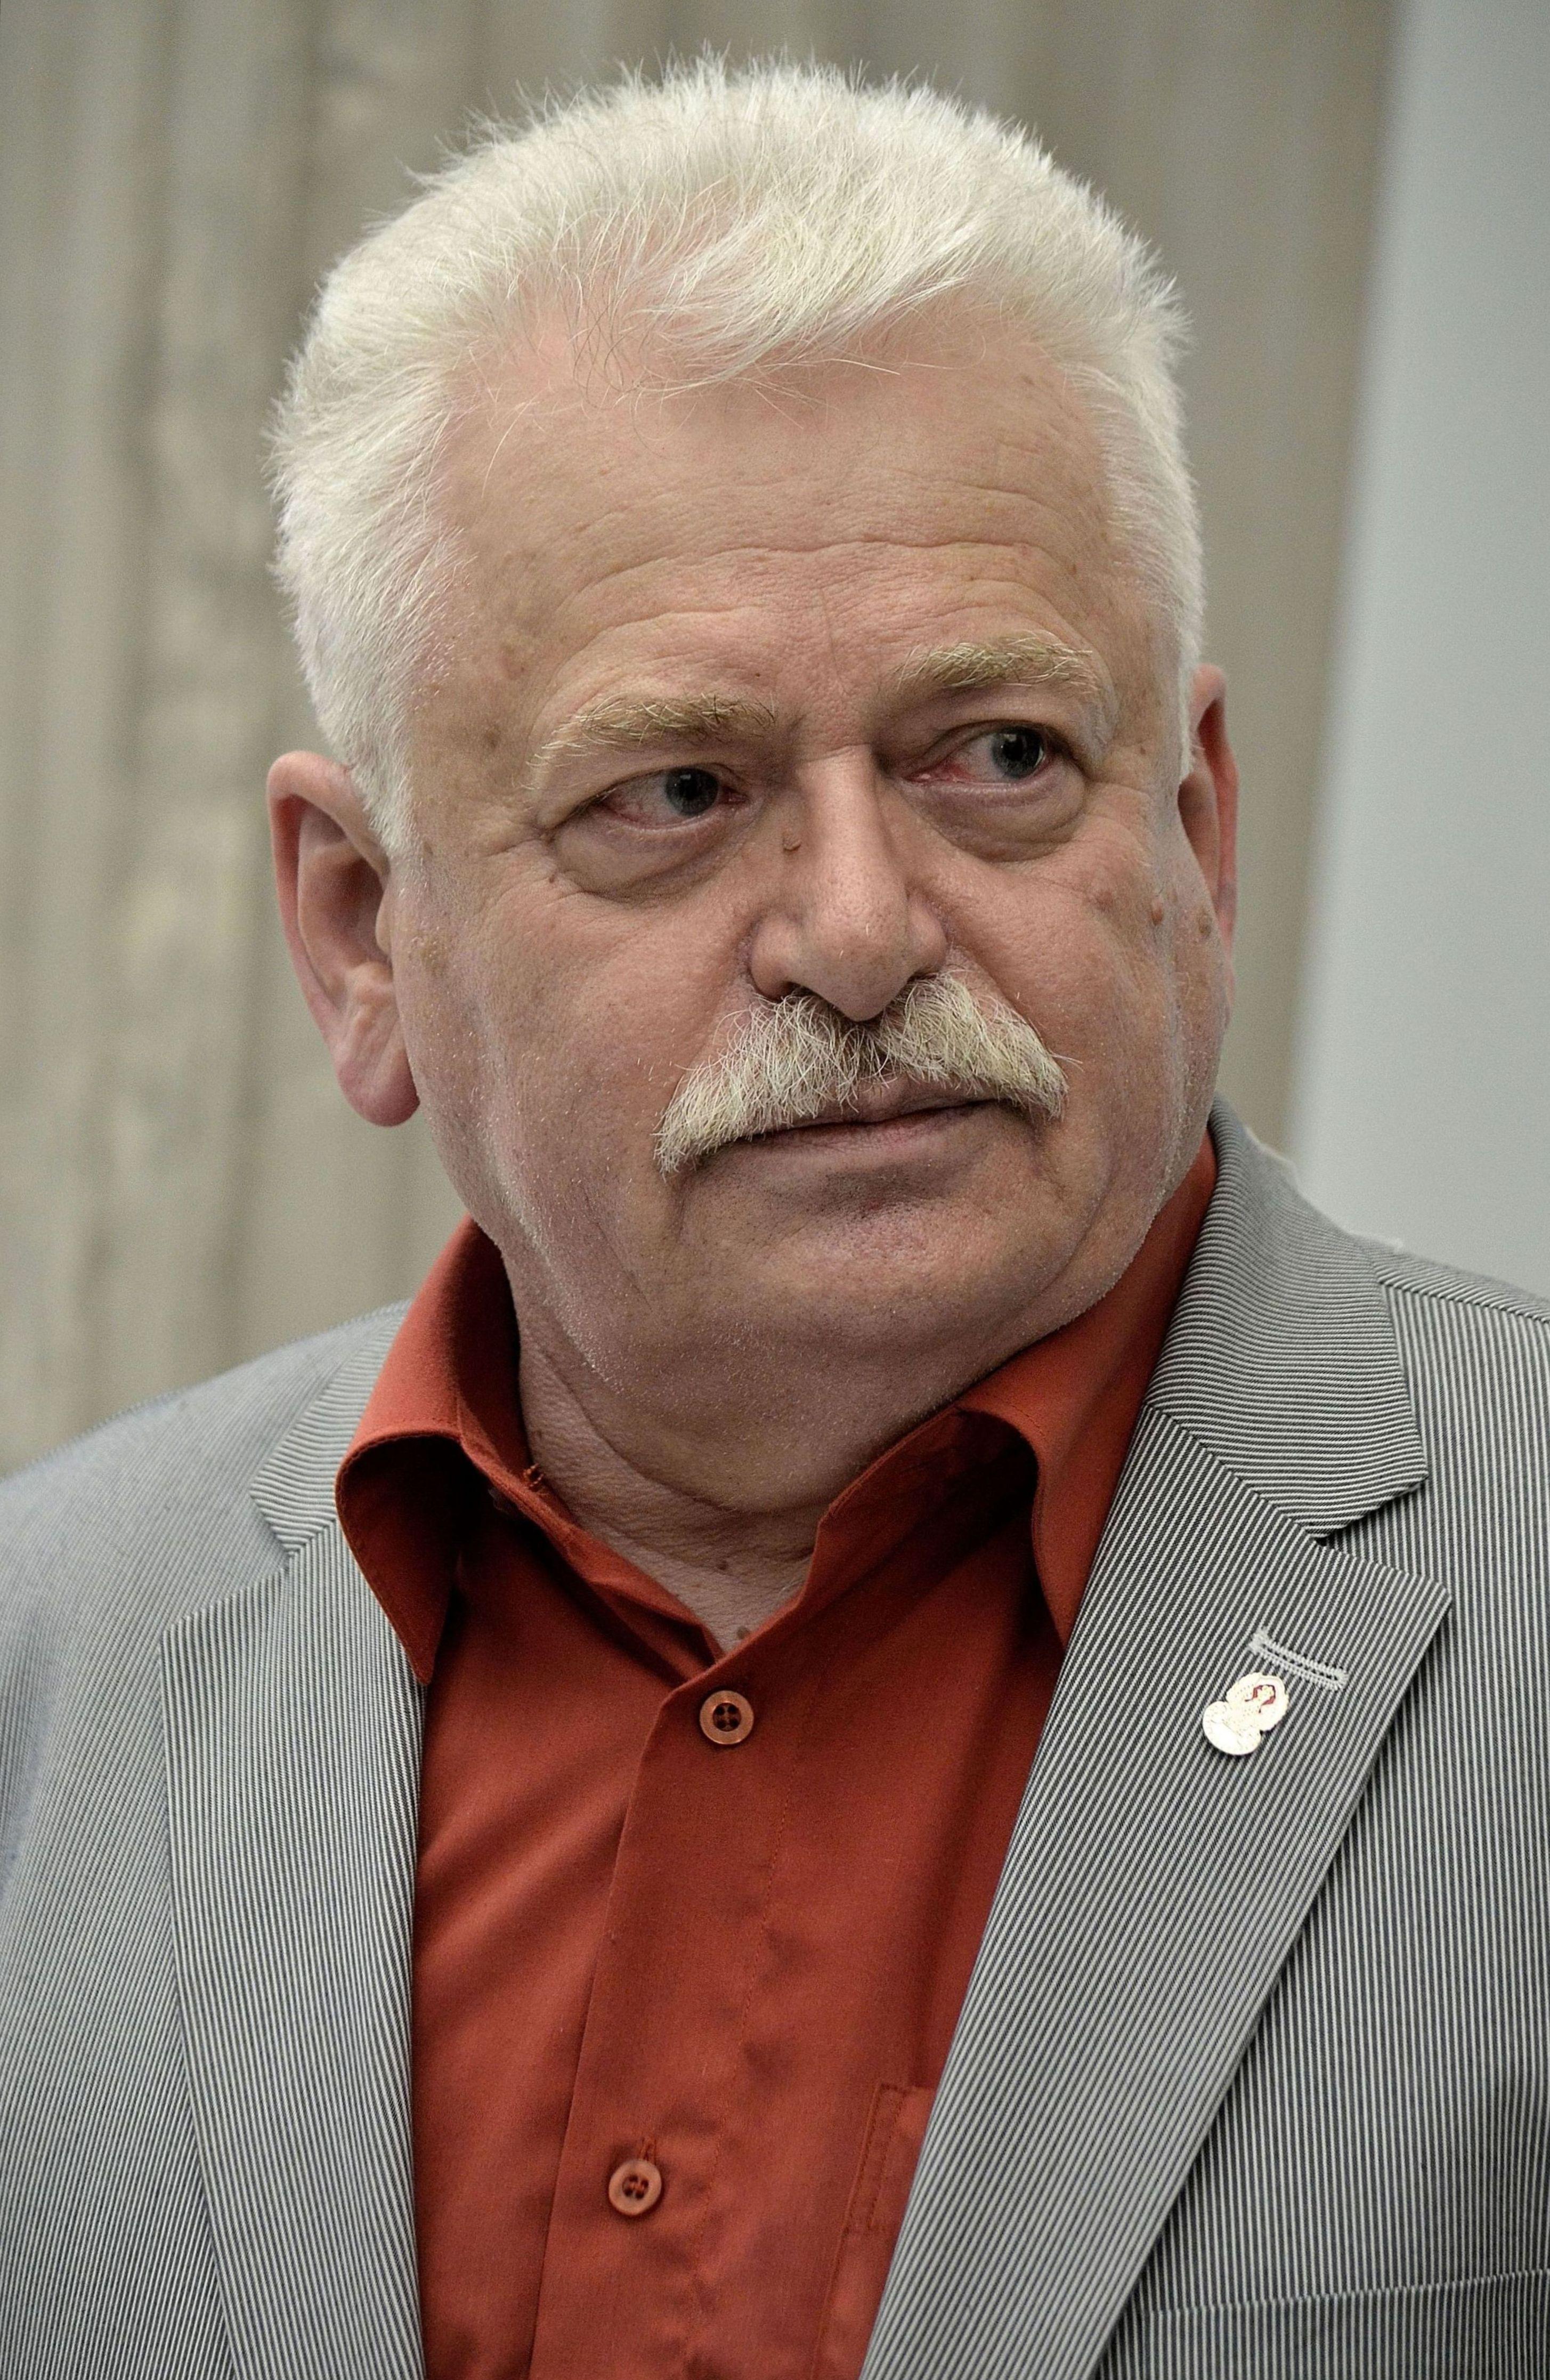 Romuald_Szeremietiew_Sejm_2015.JPG